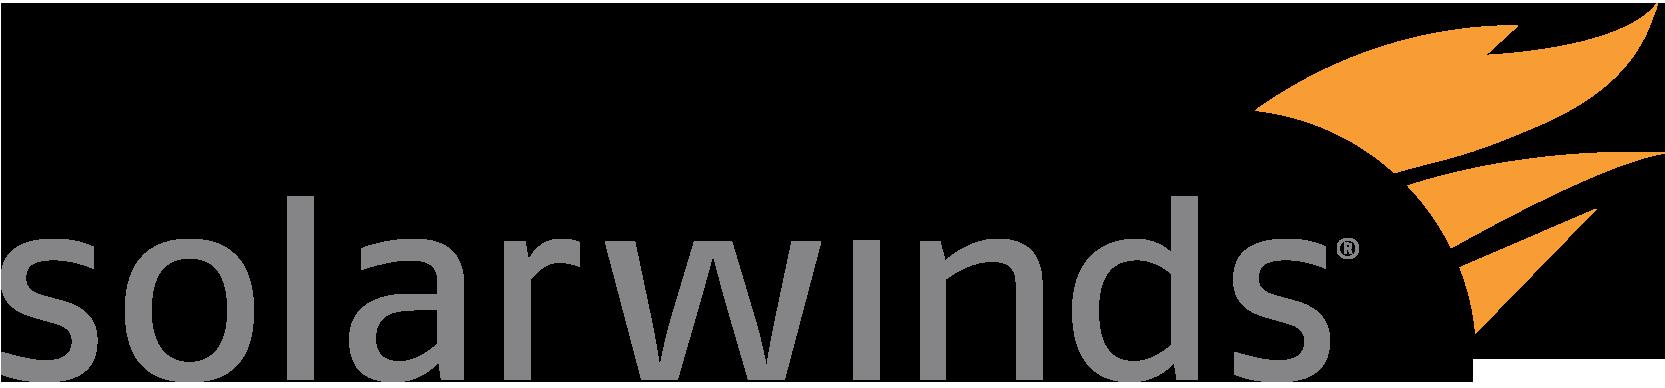 SolarWinds Systems Management Bundle logo